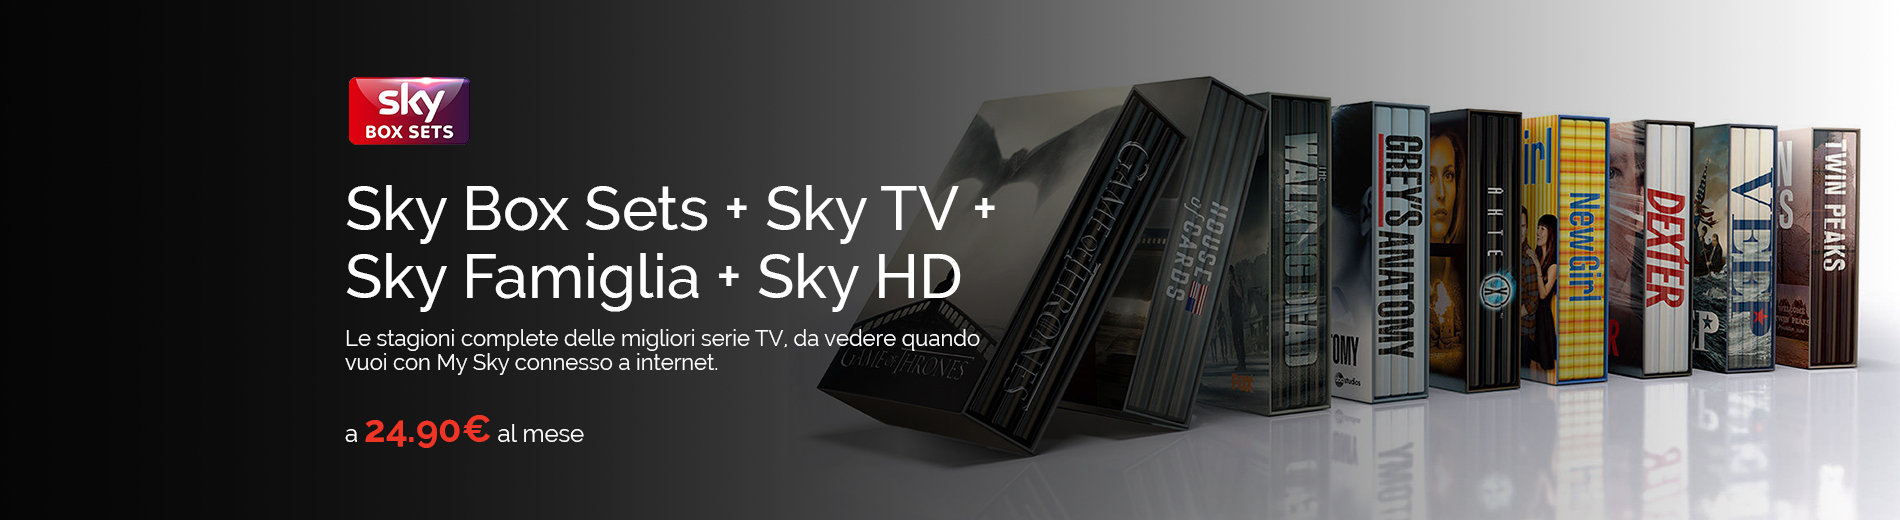 Banner_Sky-Box-Set